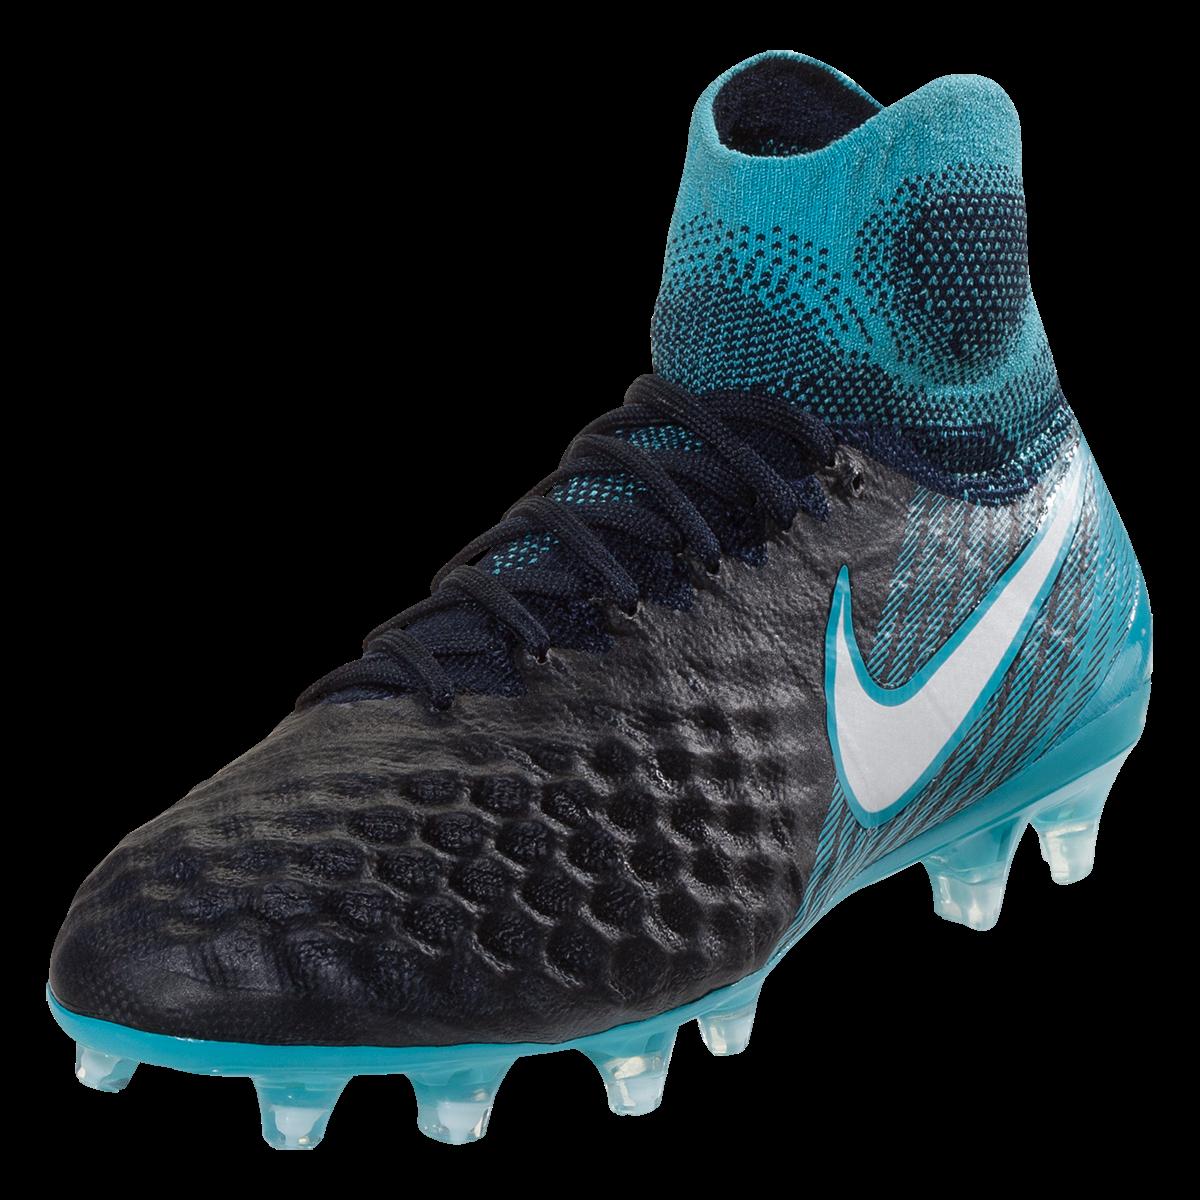 2bc7a9436a Nike Junior Magista Obra II FG Youth Soccer Cleat Thunder Blue ...